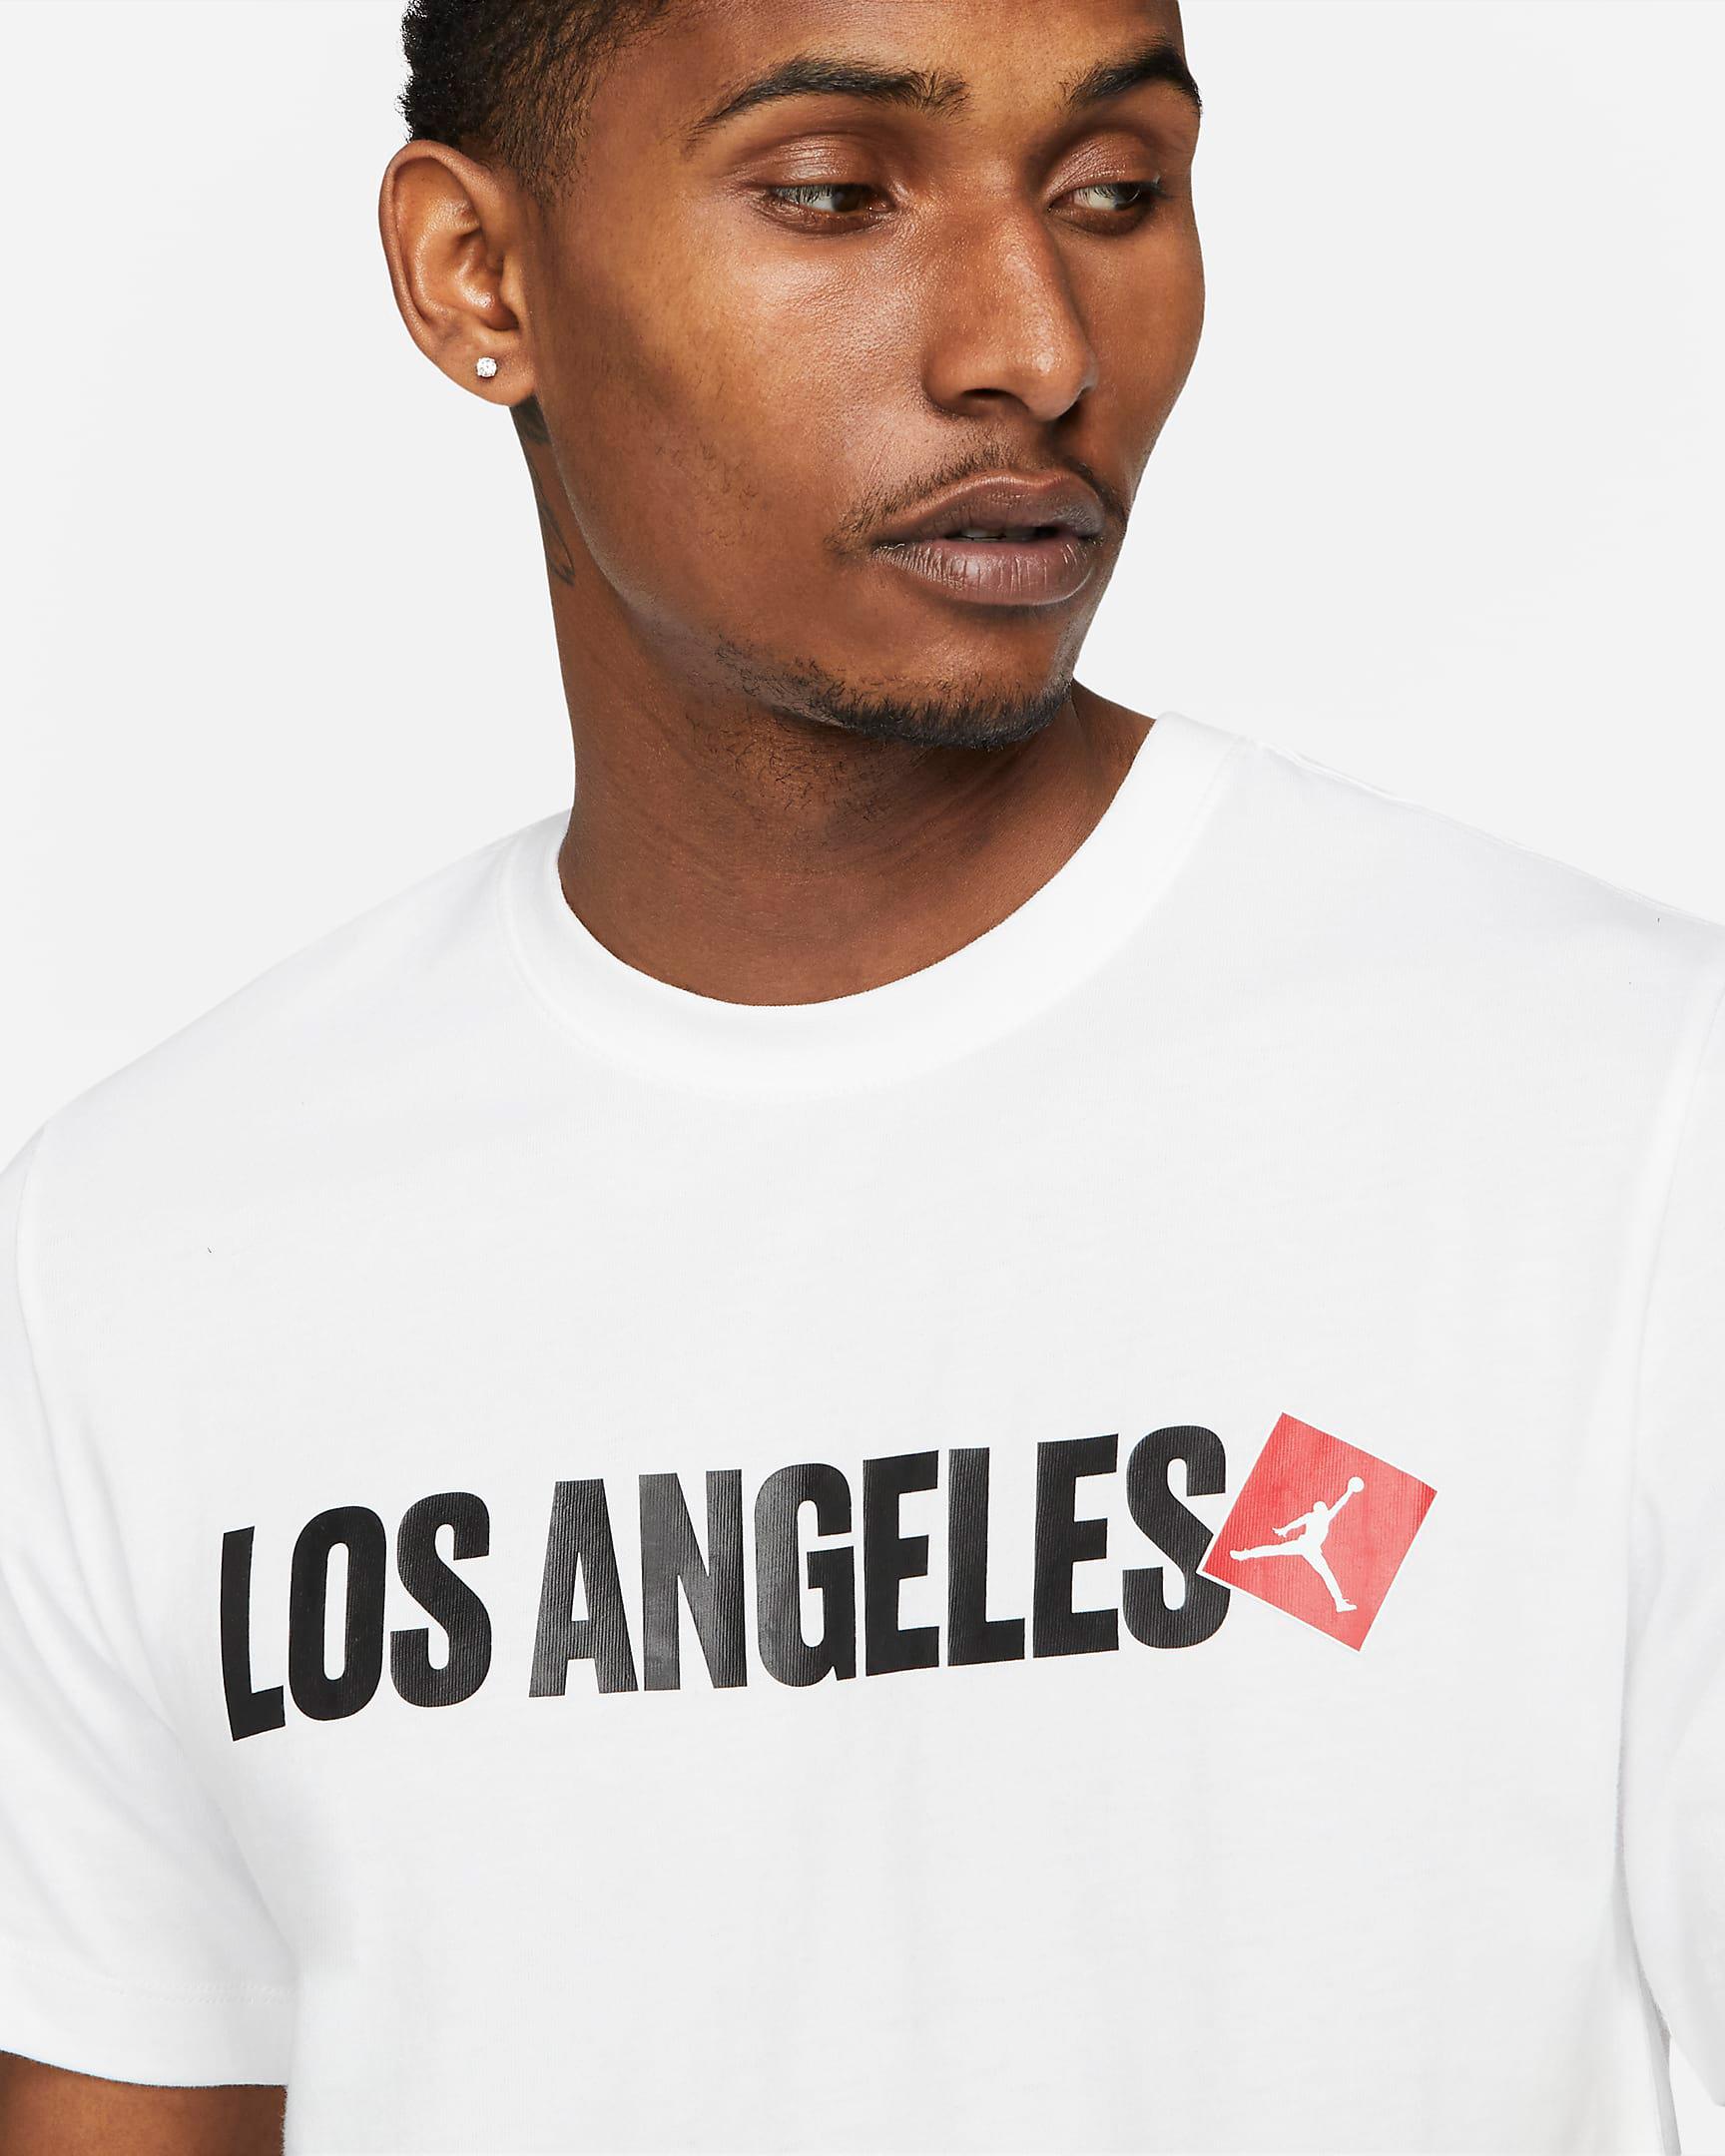 jordan-los-angeles-shirt-white-1